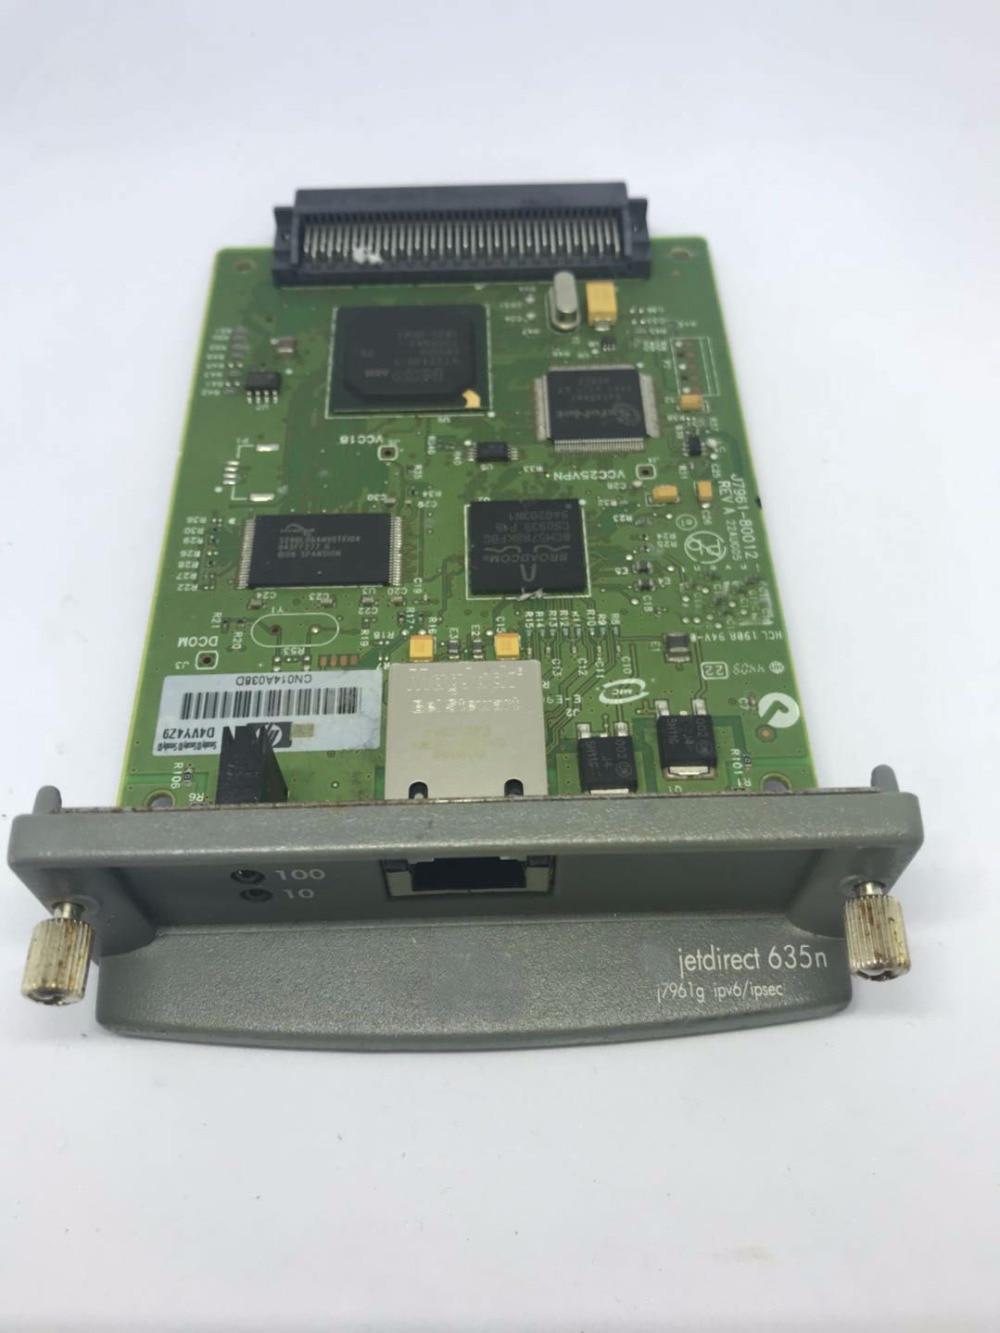 Para hp jetdirect 635n j7961g impressora interna placa de rede ipv6/gigabit impressora a laser